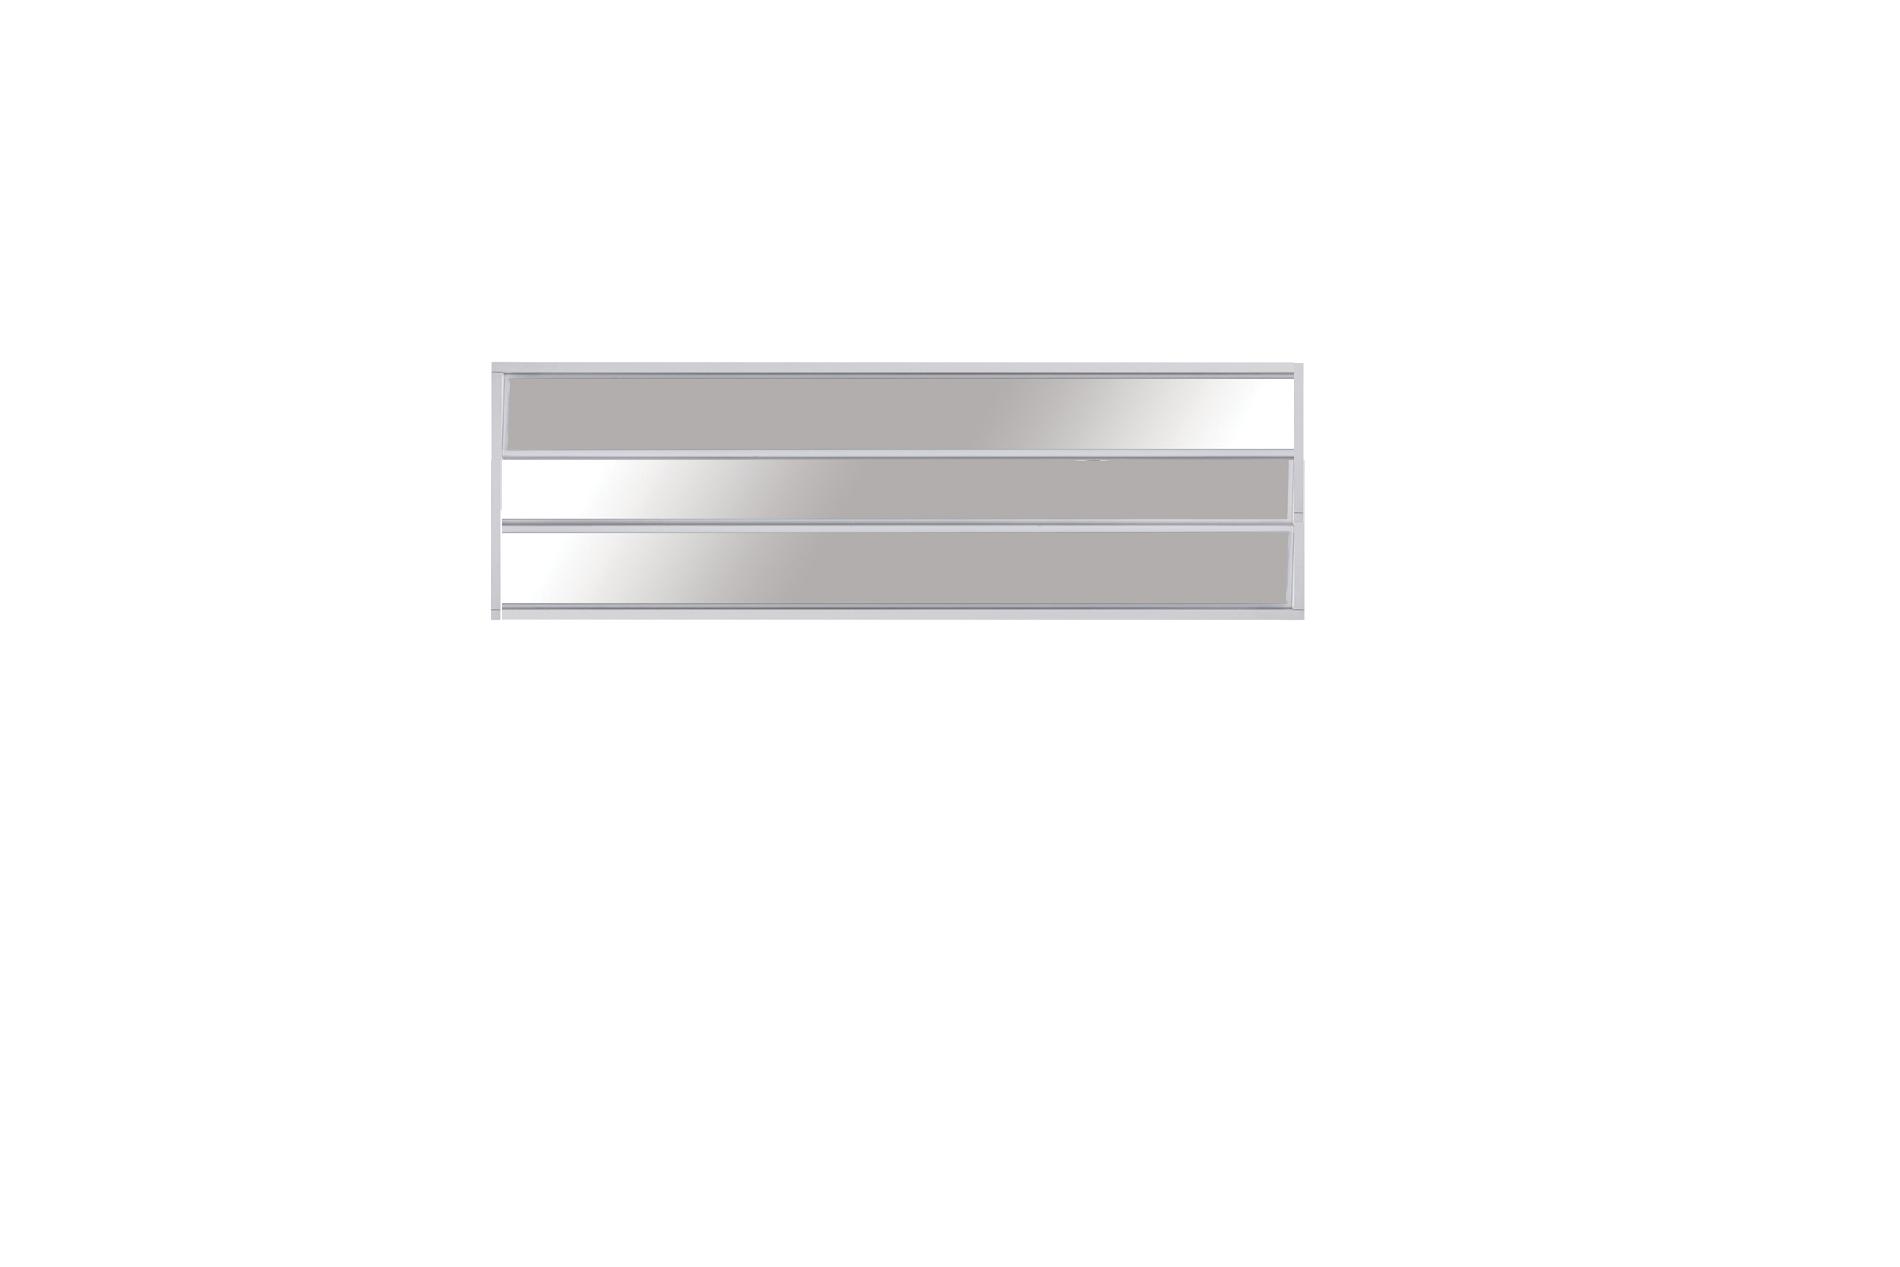 Luna Ekru Konsol Aynası